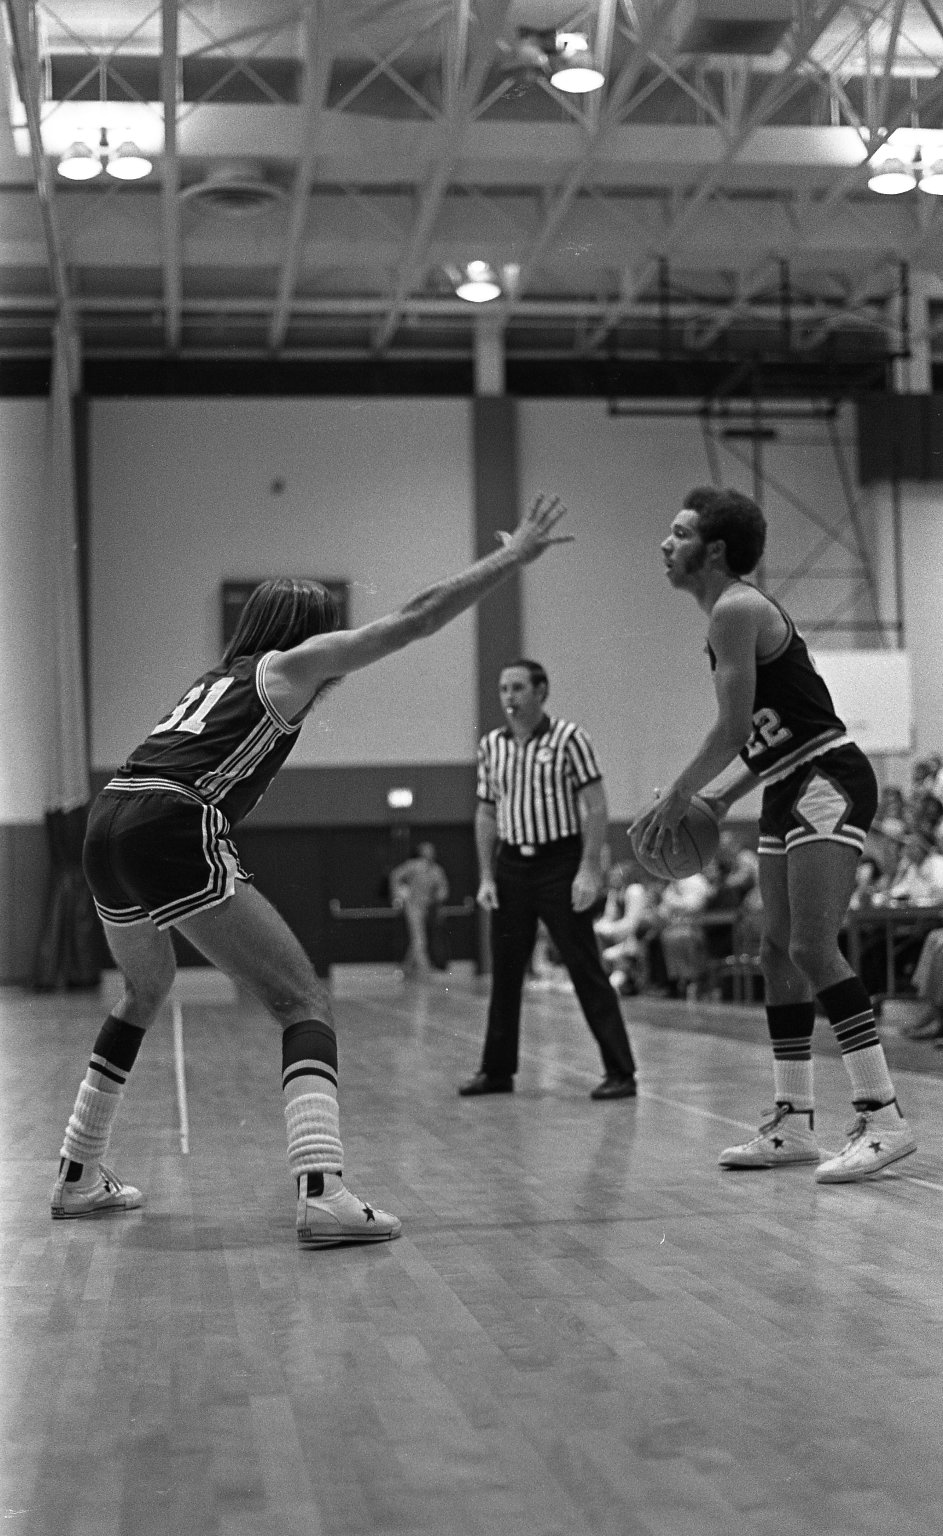 Basketball - George Mason University vs. Athletes in Action 12